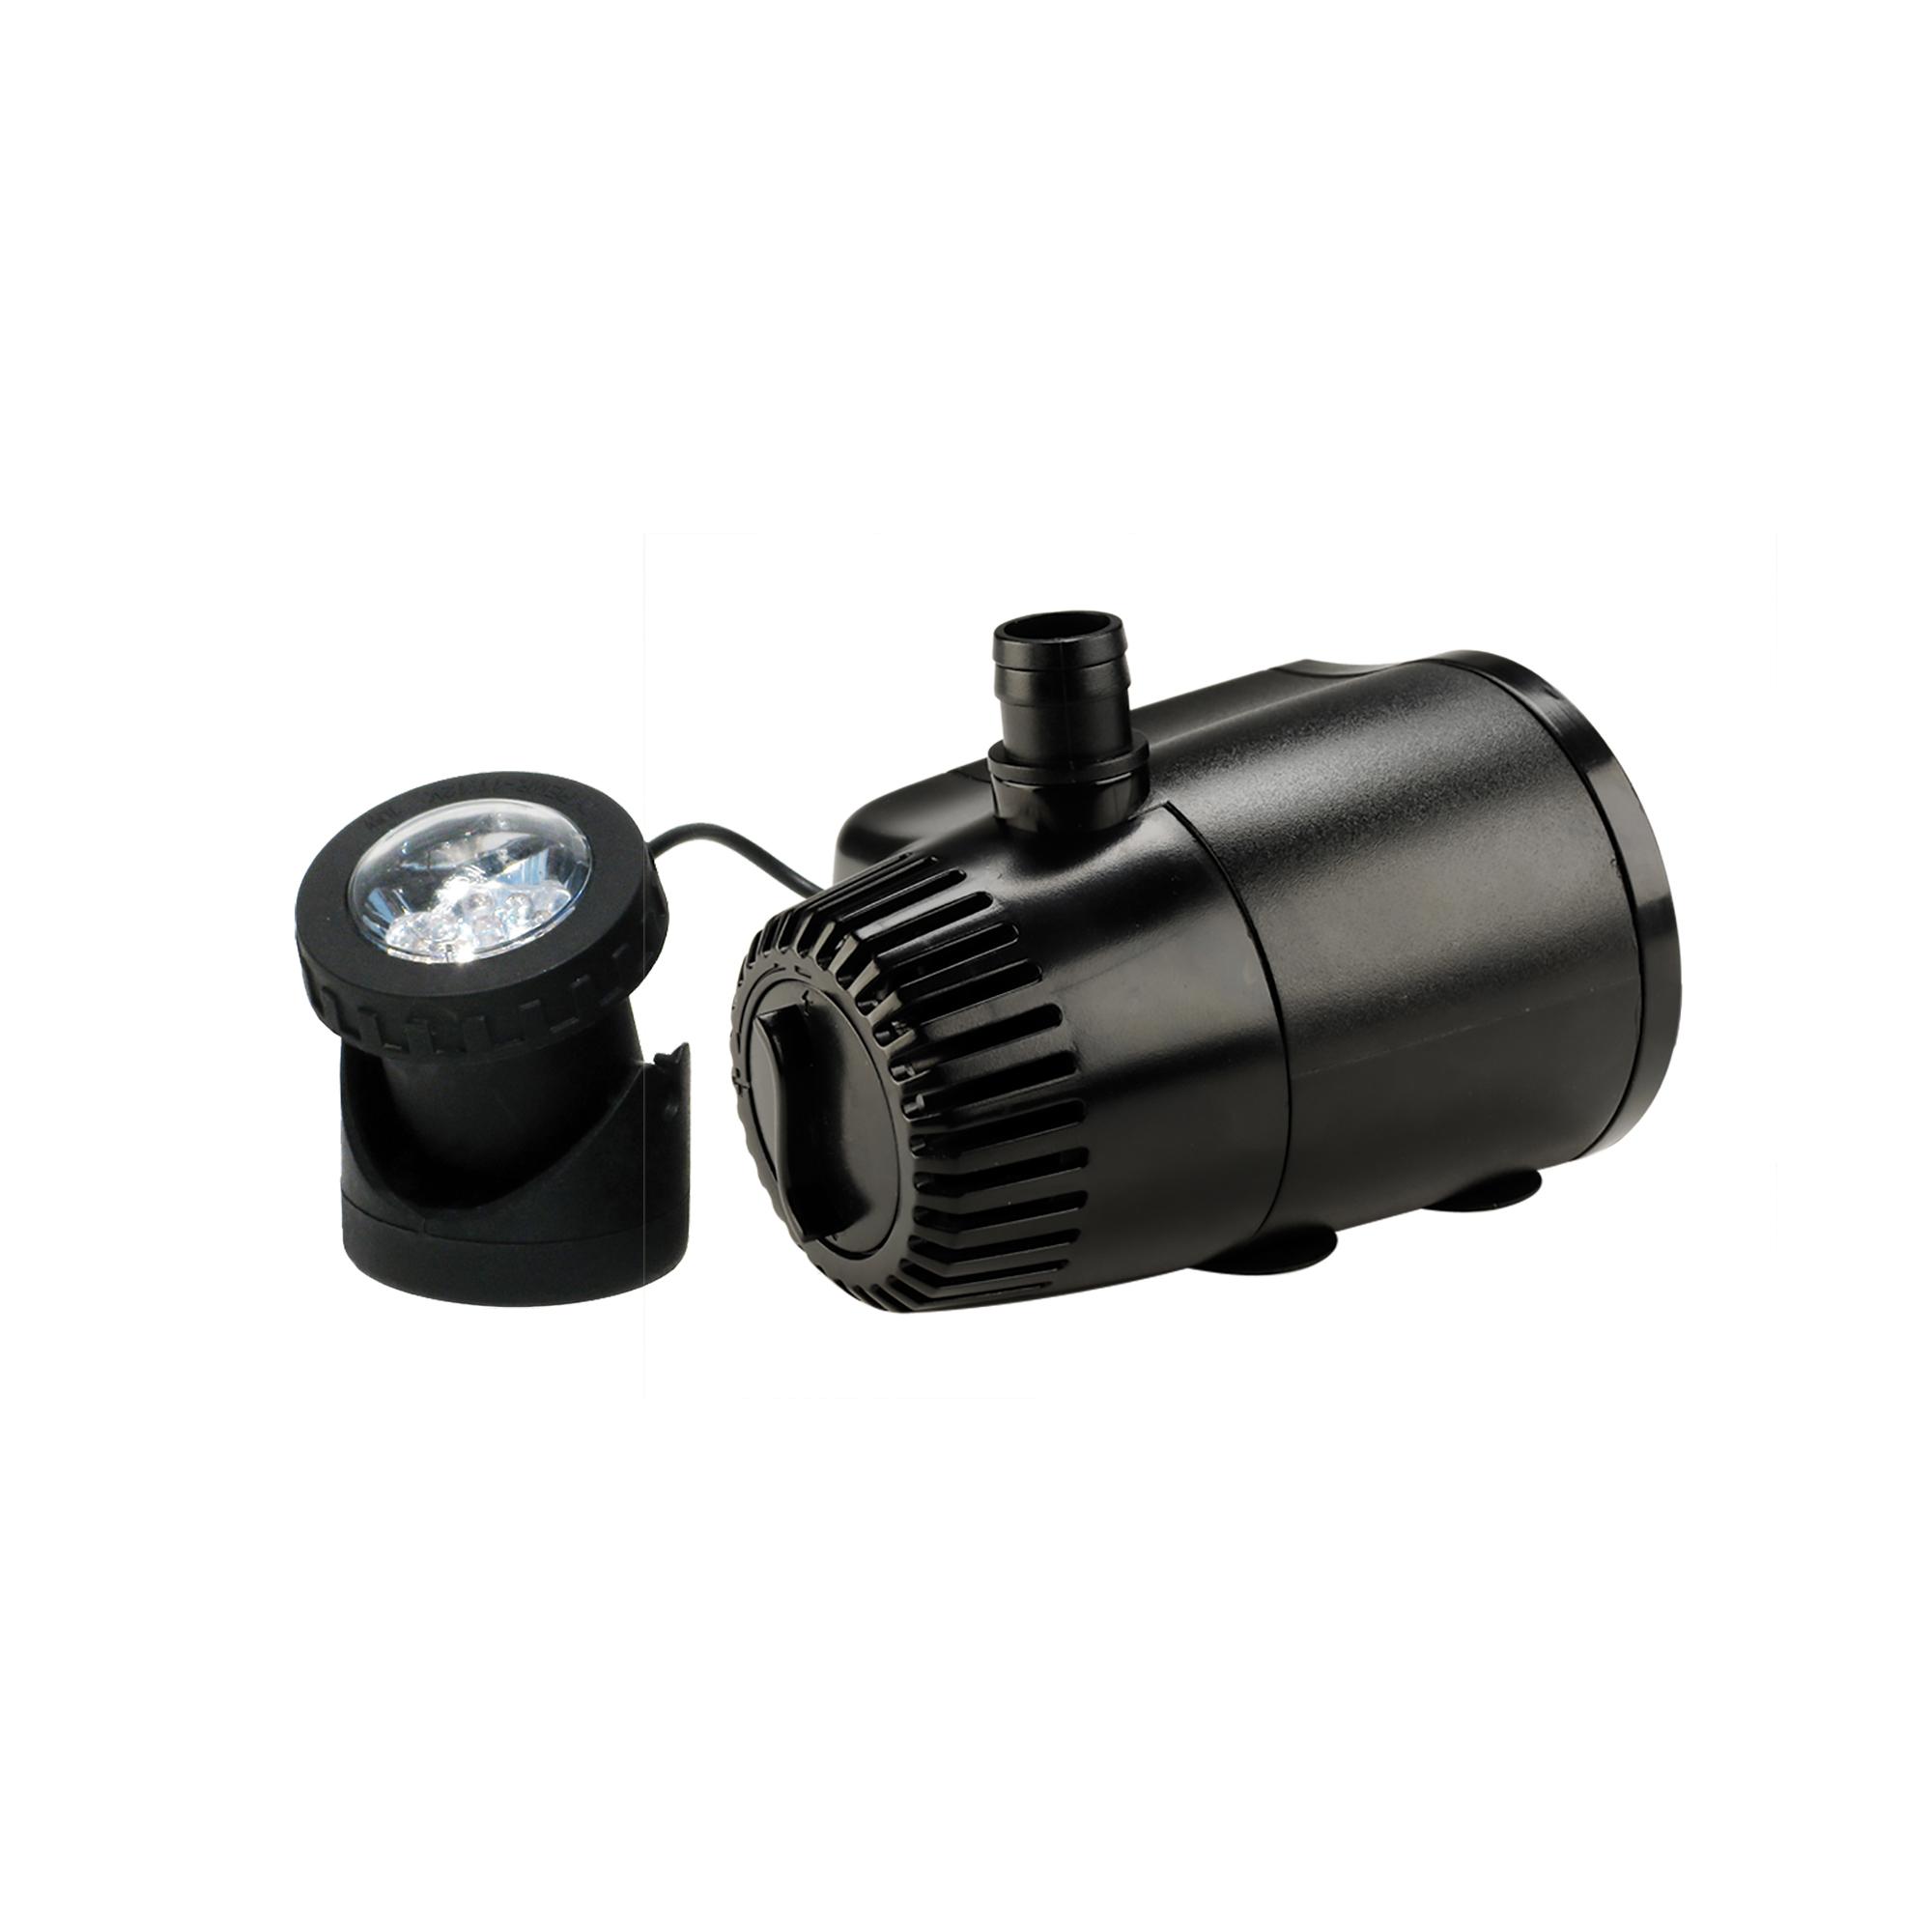 140 GPH Auto Shut-Off Pump with Light